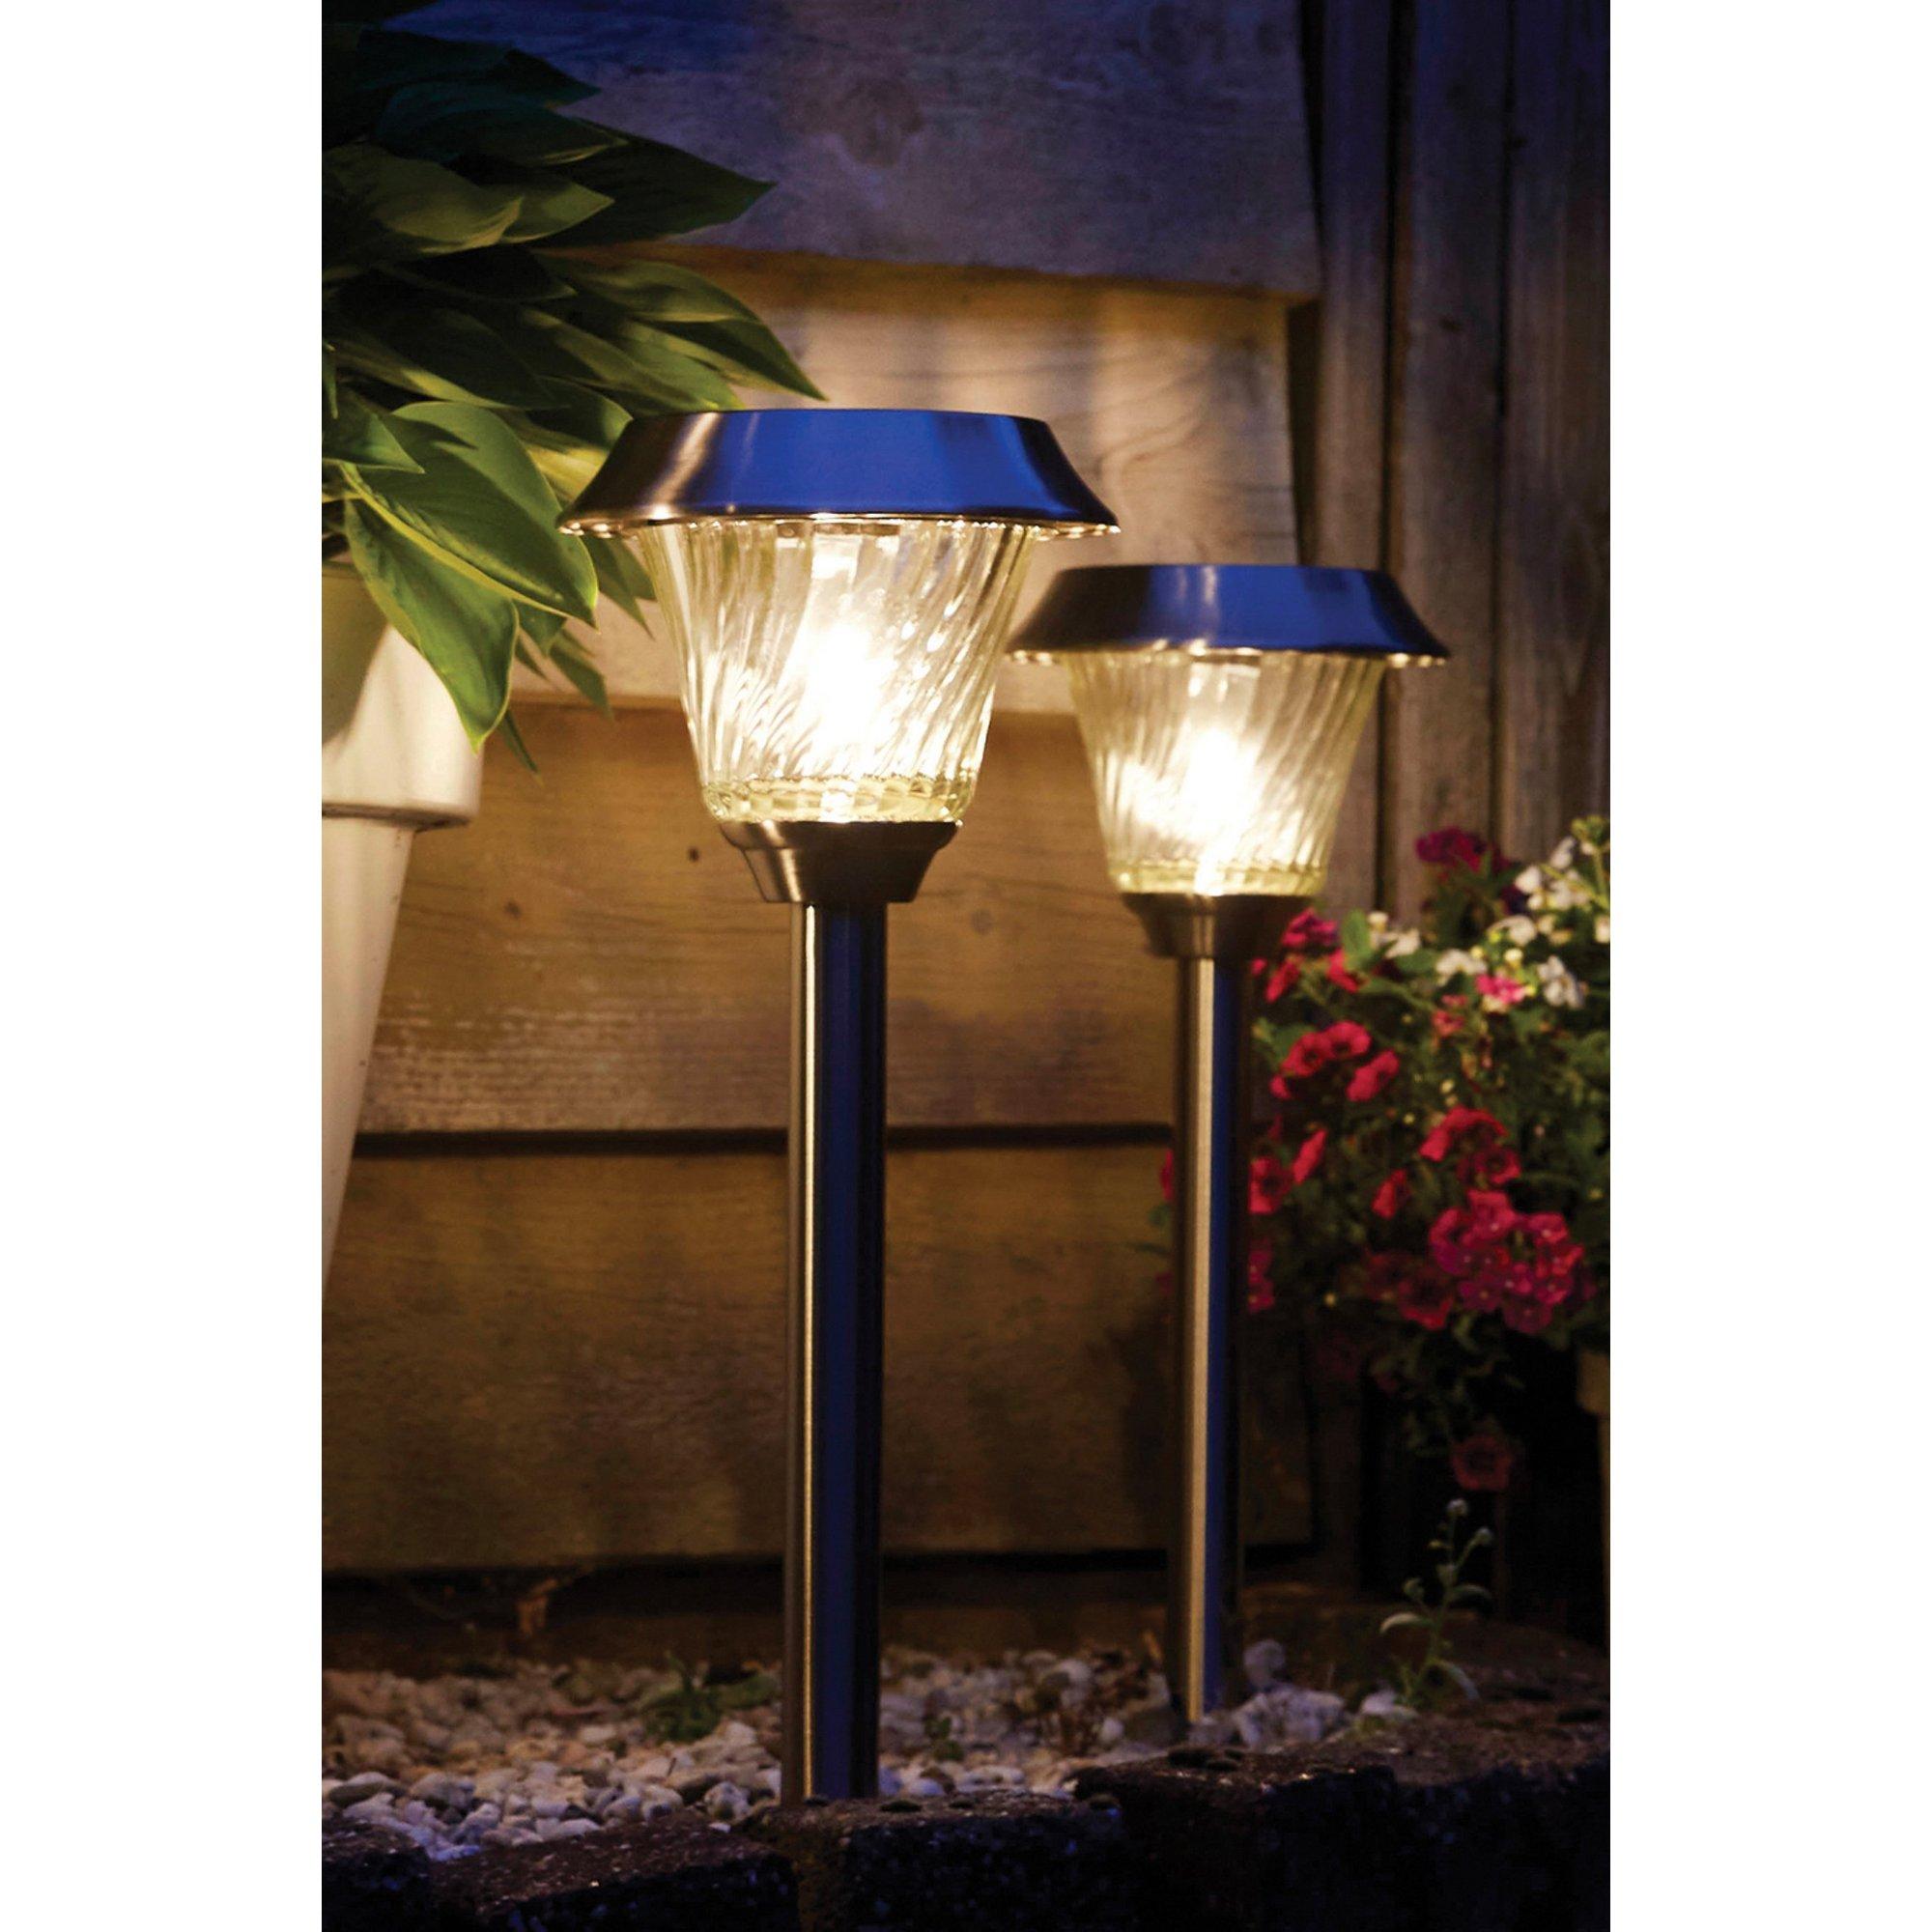 Image of Luxform Lighting Mizar Intelligent Solar LED Spike Light